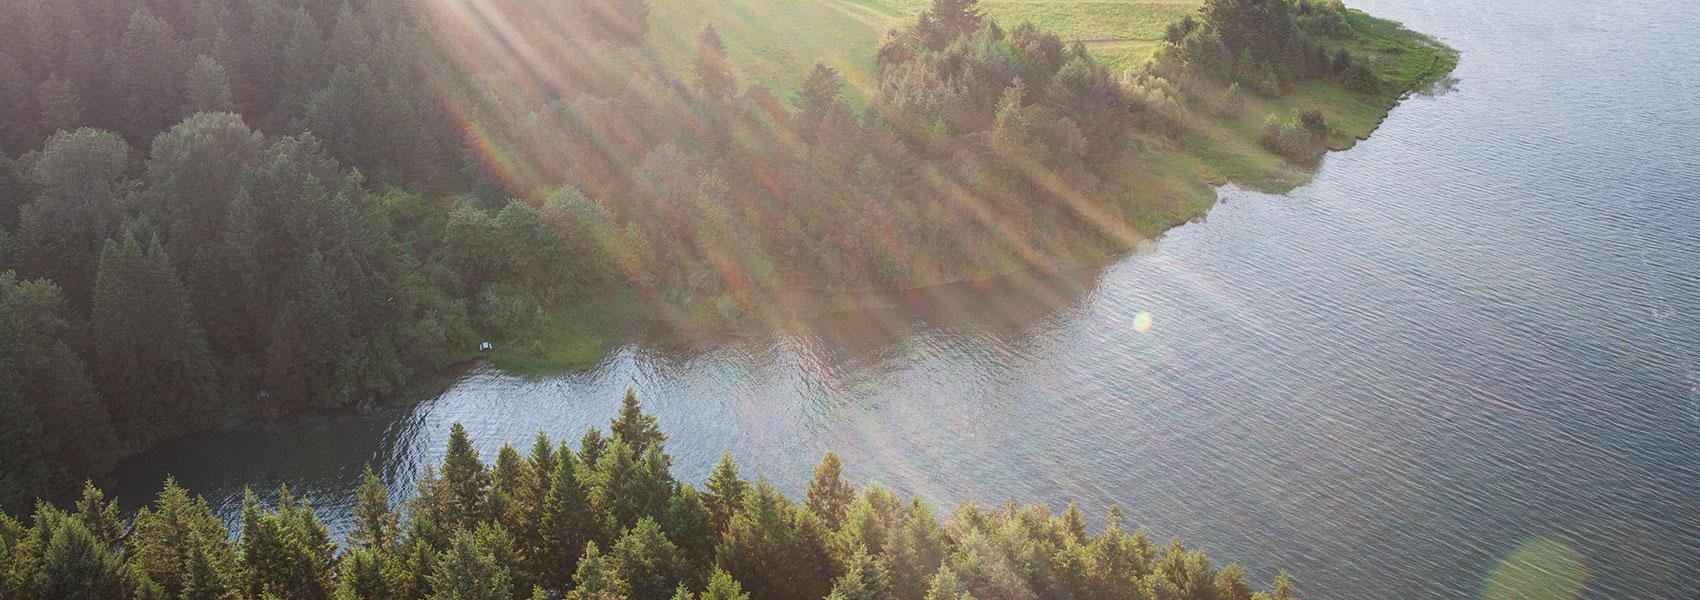 hagg-lake-aerial- banner